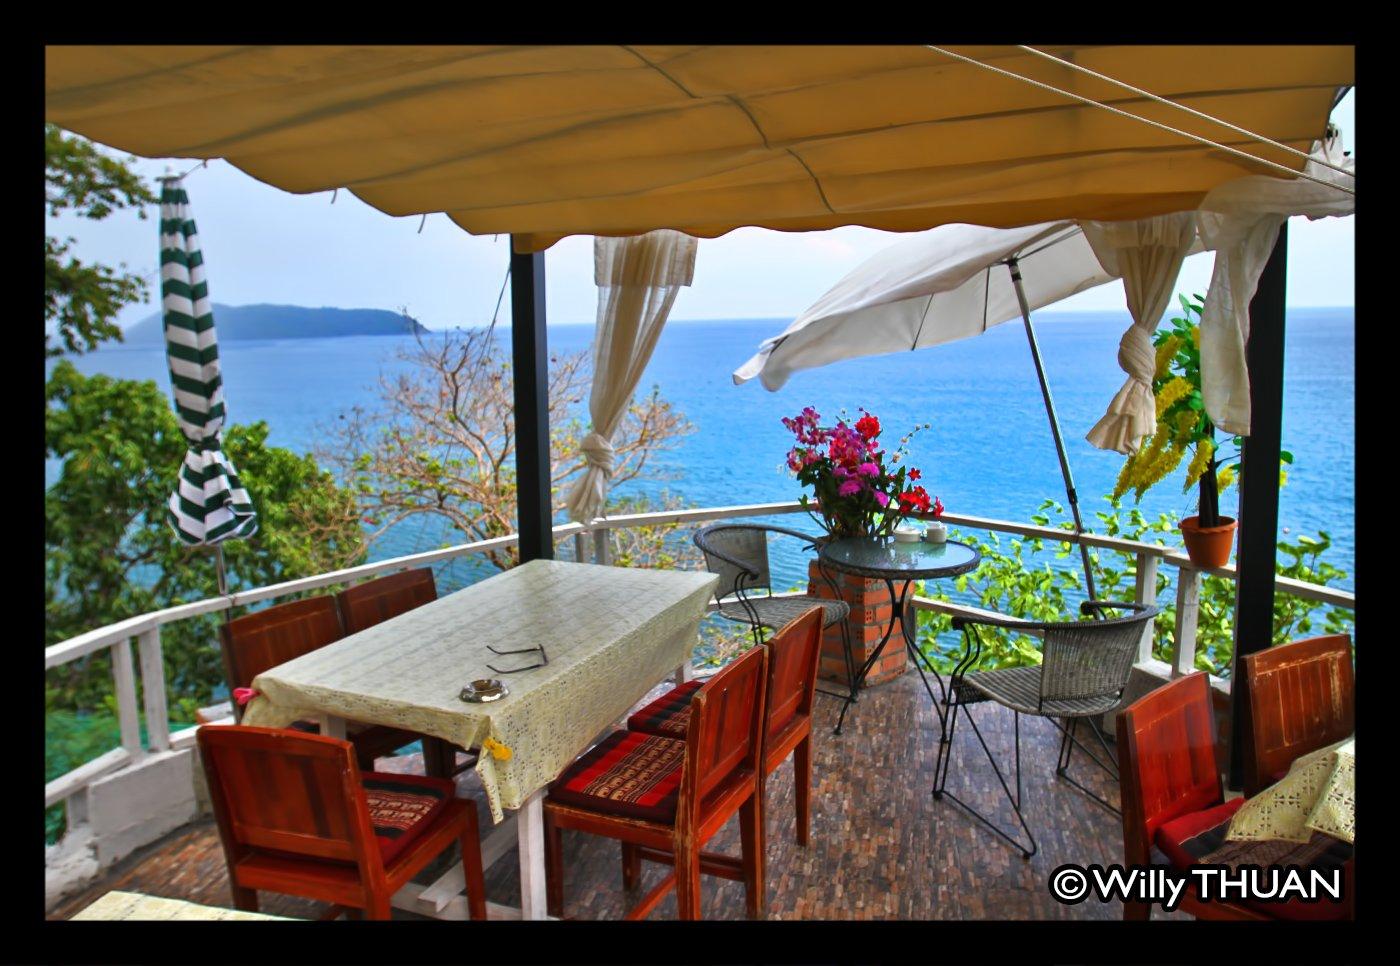 Romsai Restaurant near Kamala Beach